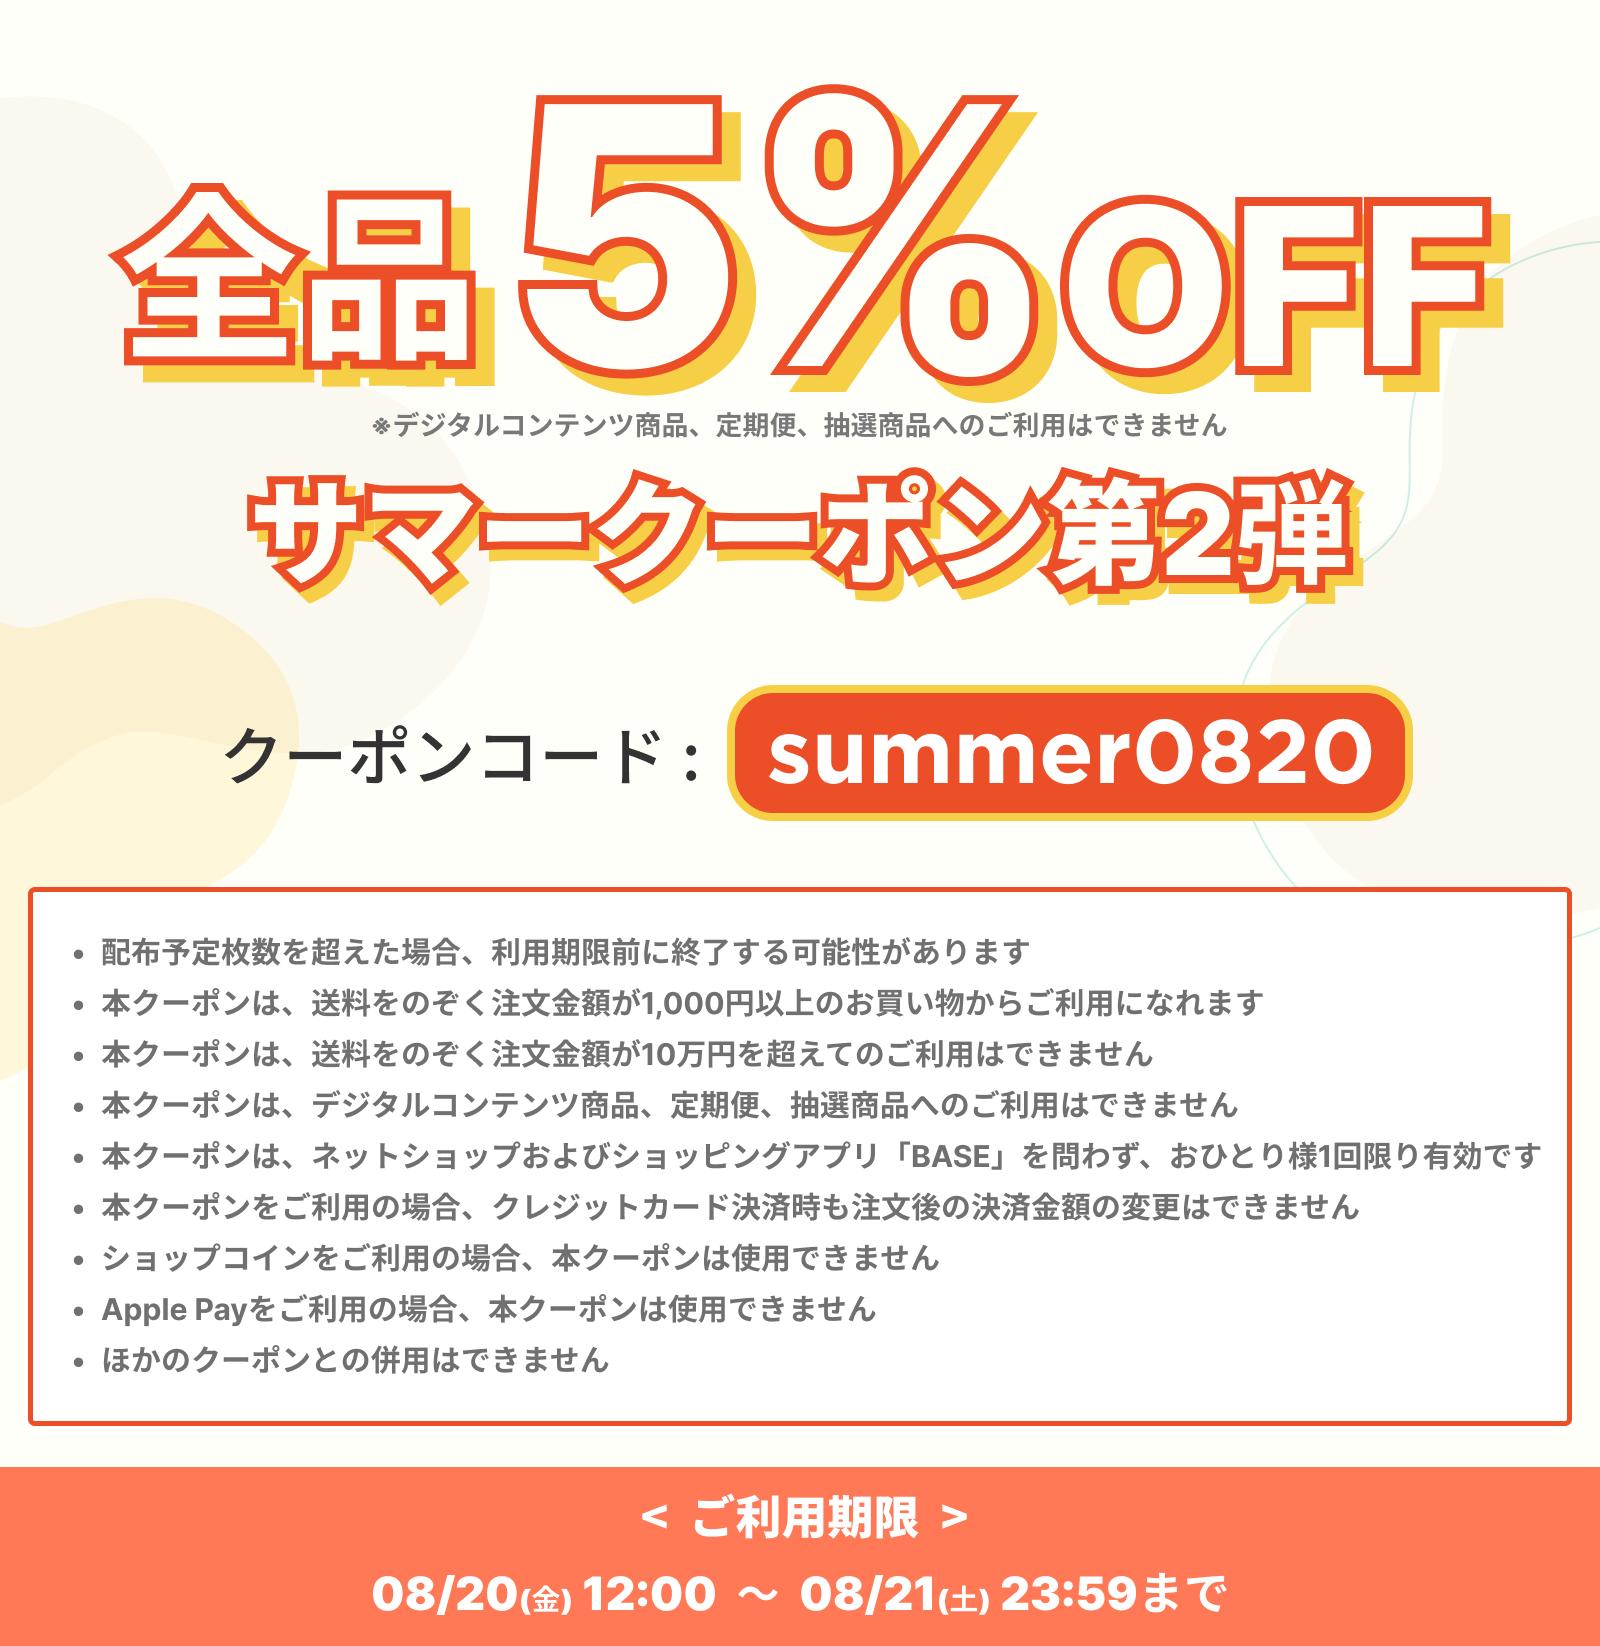 8/20~8/21「BASE」5%OFFクーポンキャンペーン